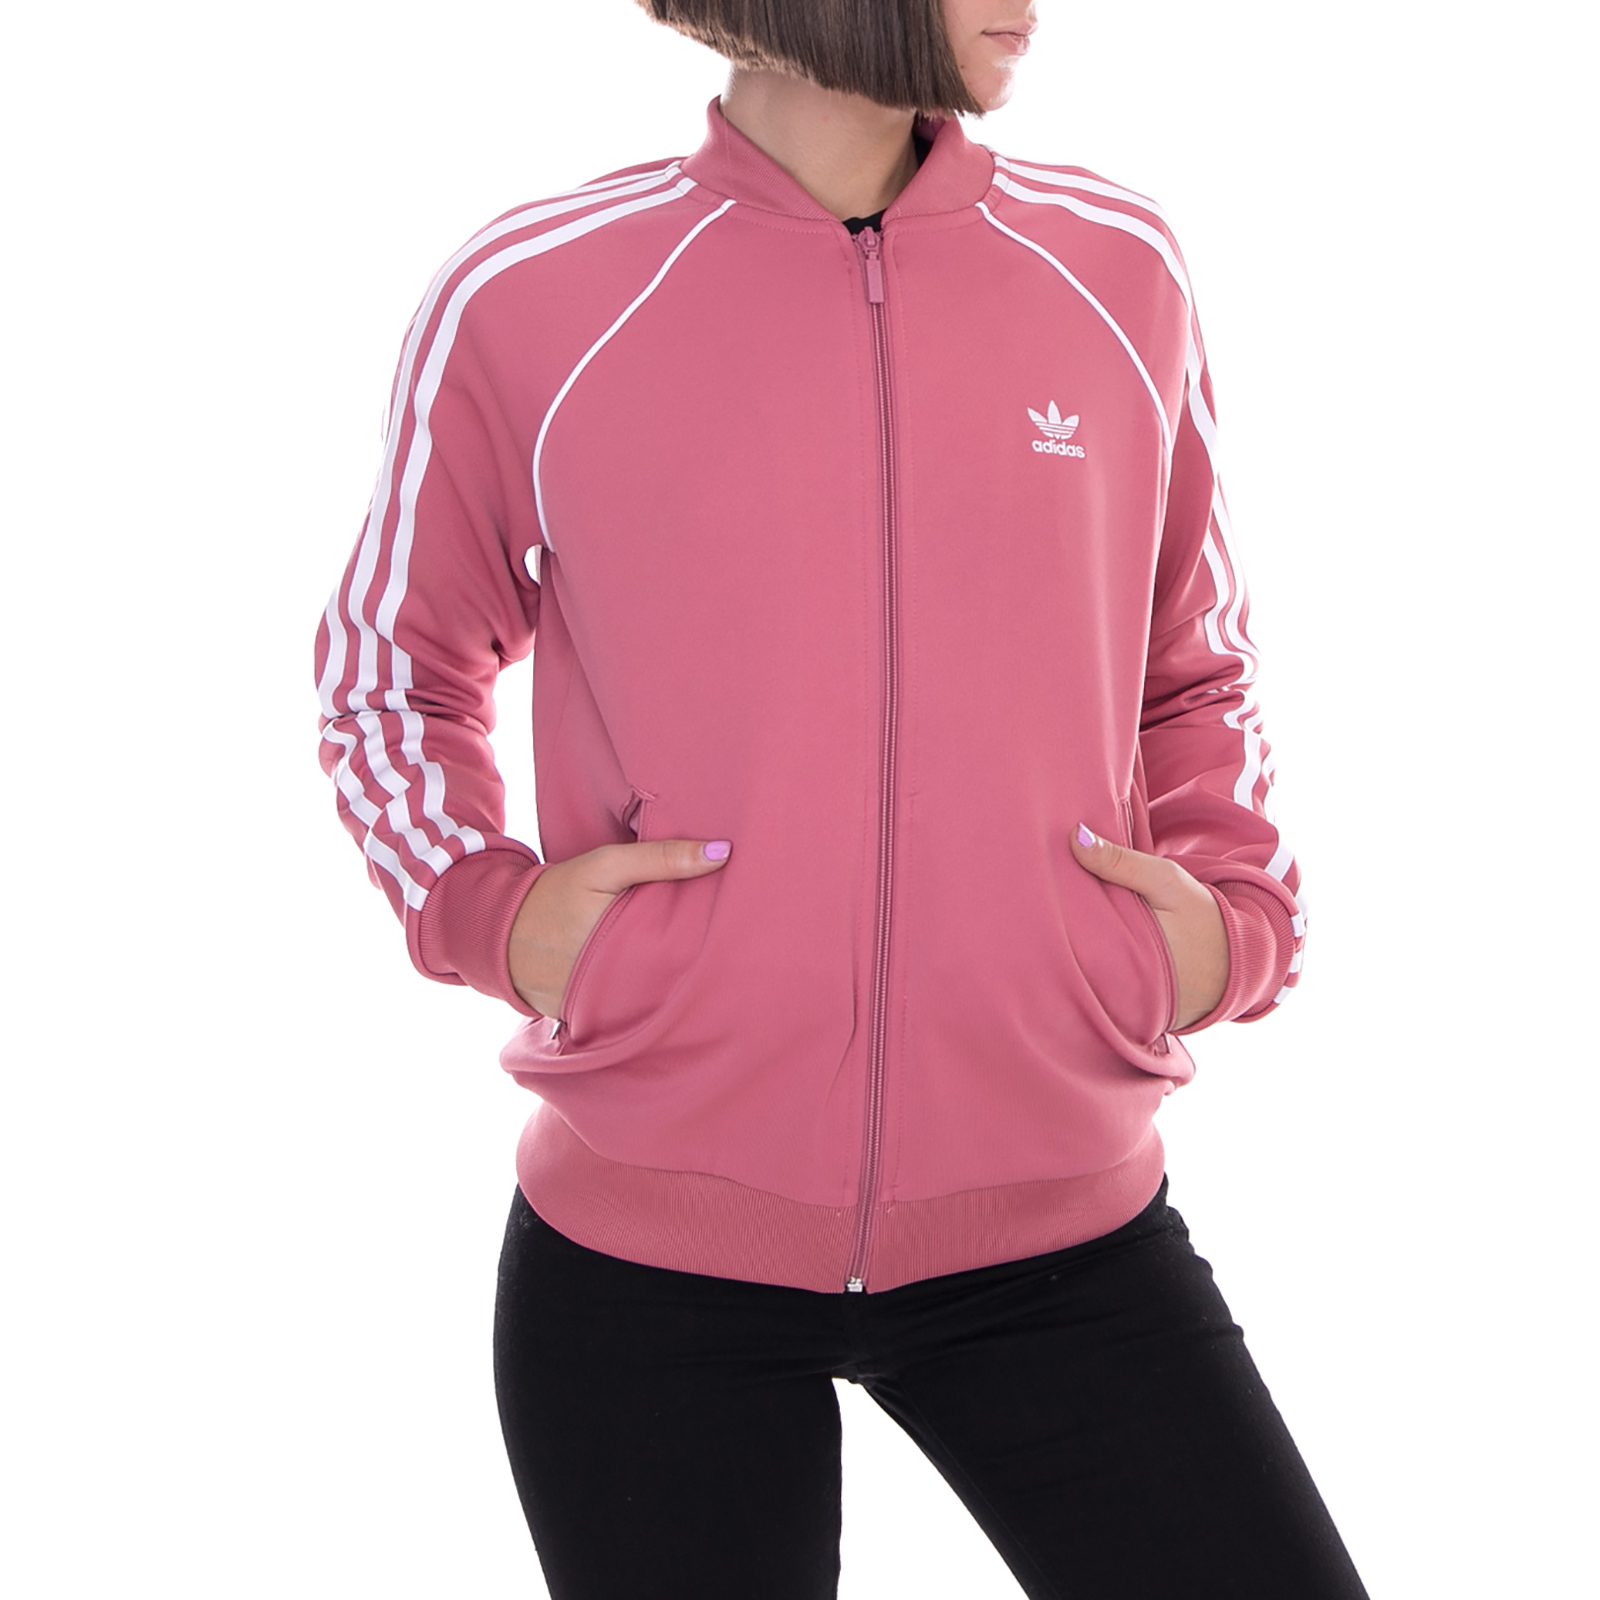 Maroon Ebay Jacket Adidas Purple Violet Trace nxE6vvTH